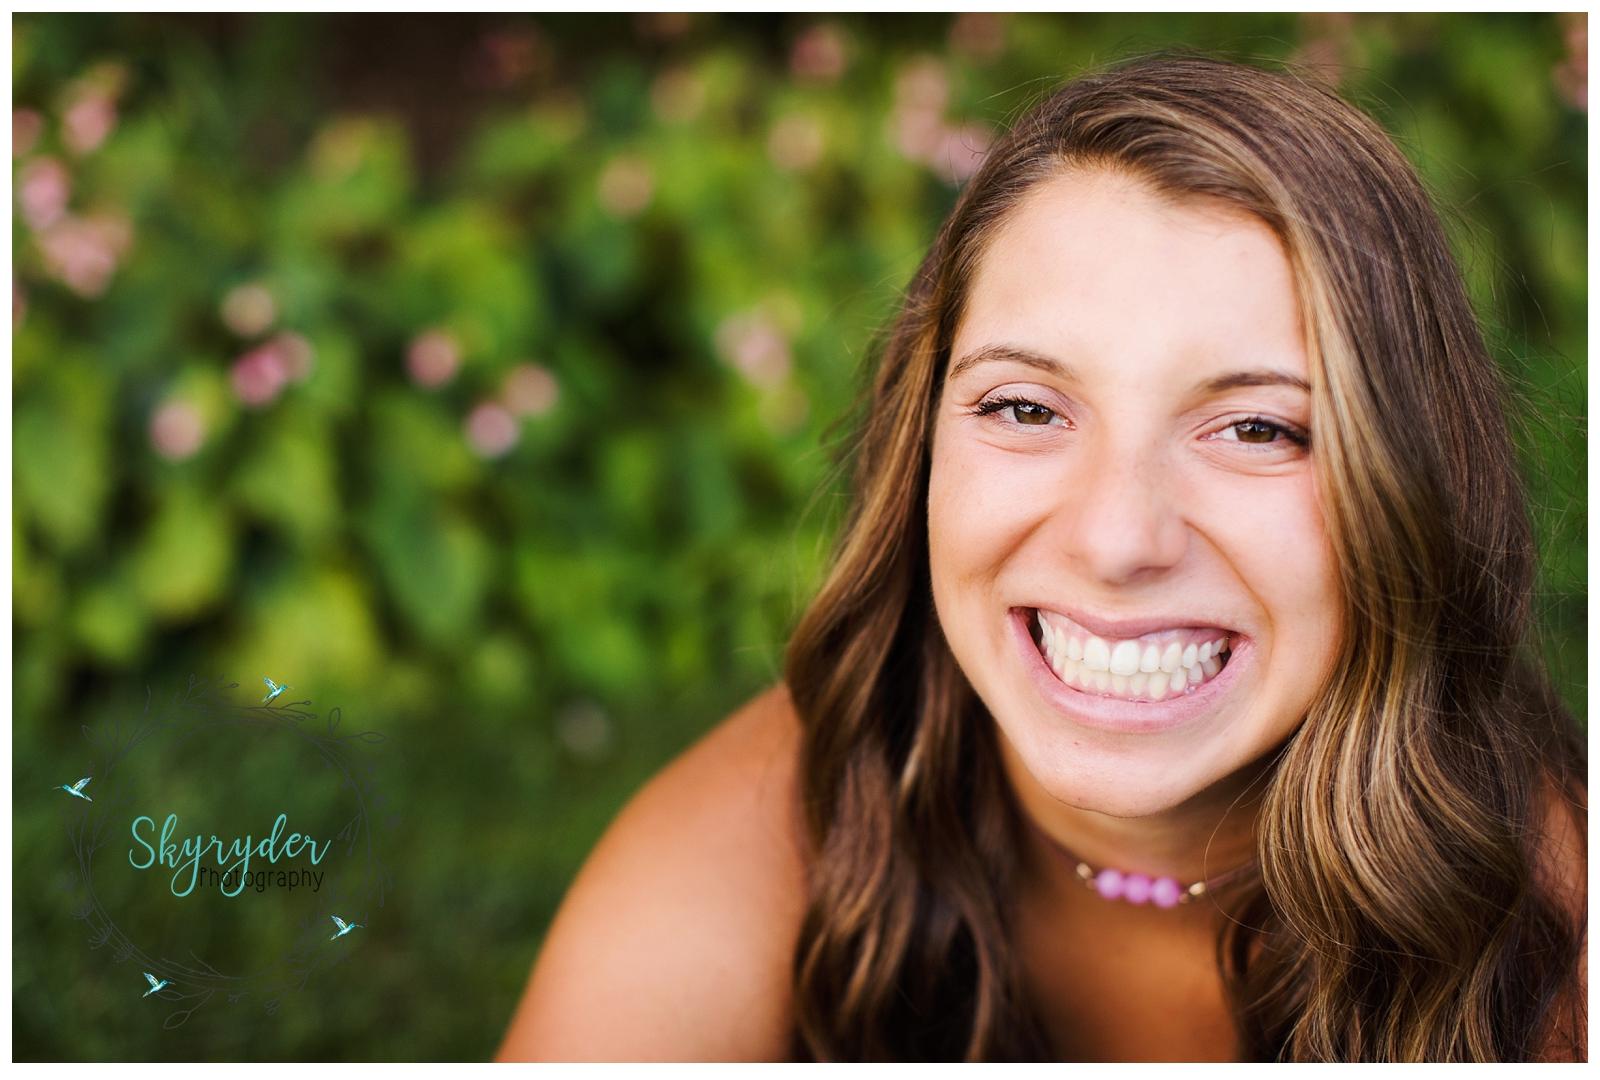 skyryder Blacksburg high school senior session photographer virginia tech vt hokie roanoke